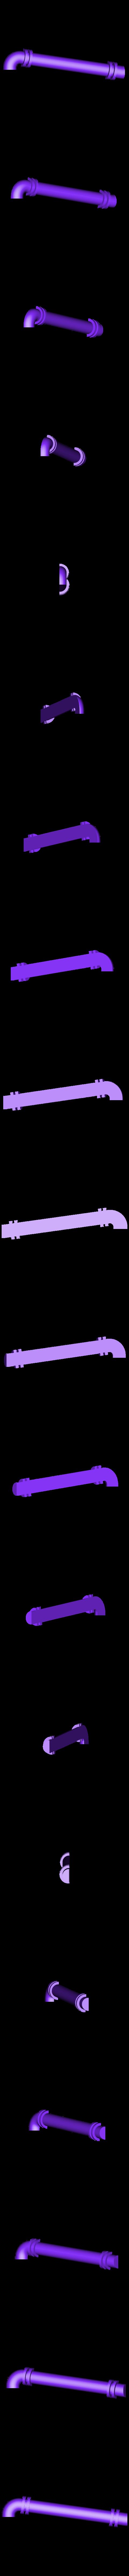 MirrorSteam_Pipe_-_Back_Engine-E.STL Download free STL file 4-8-8-4 Big Boy Locomotive • 3D printer object, RaymondDeLuca